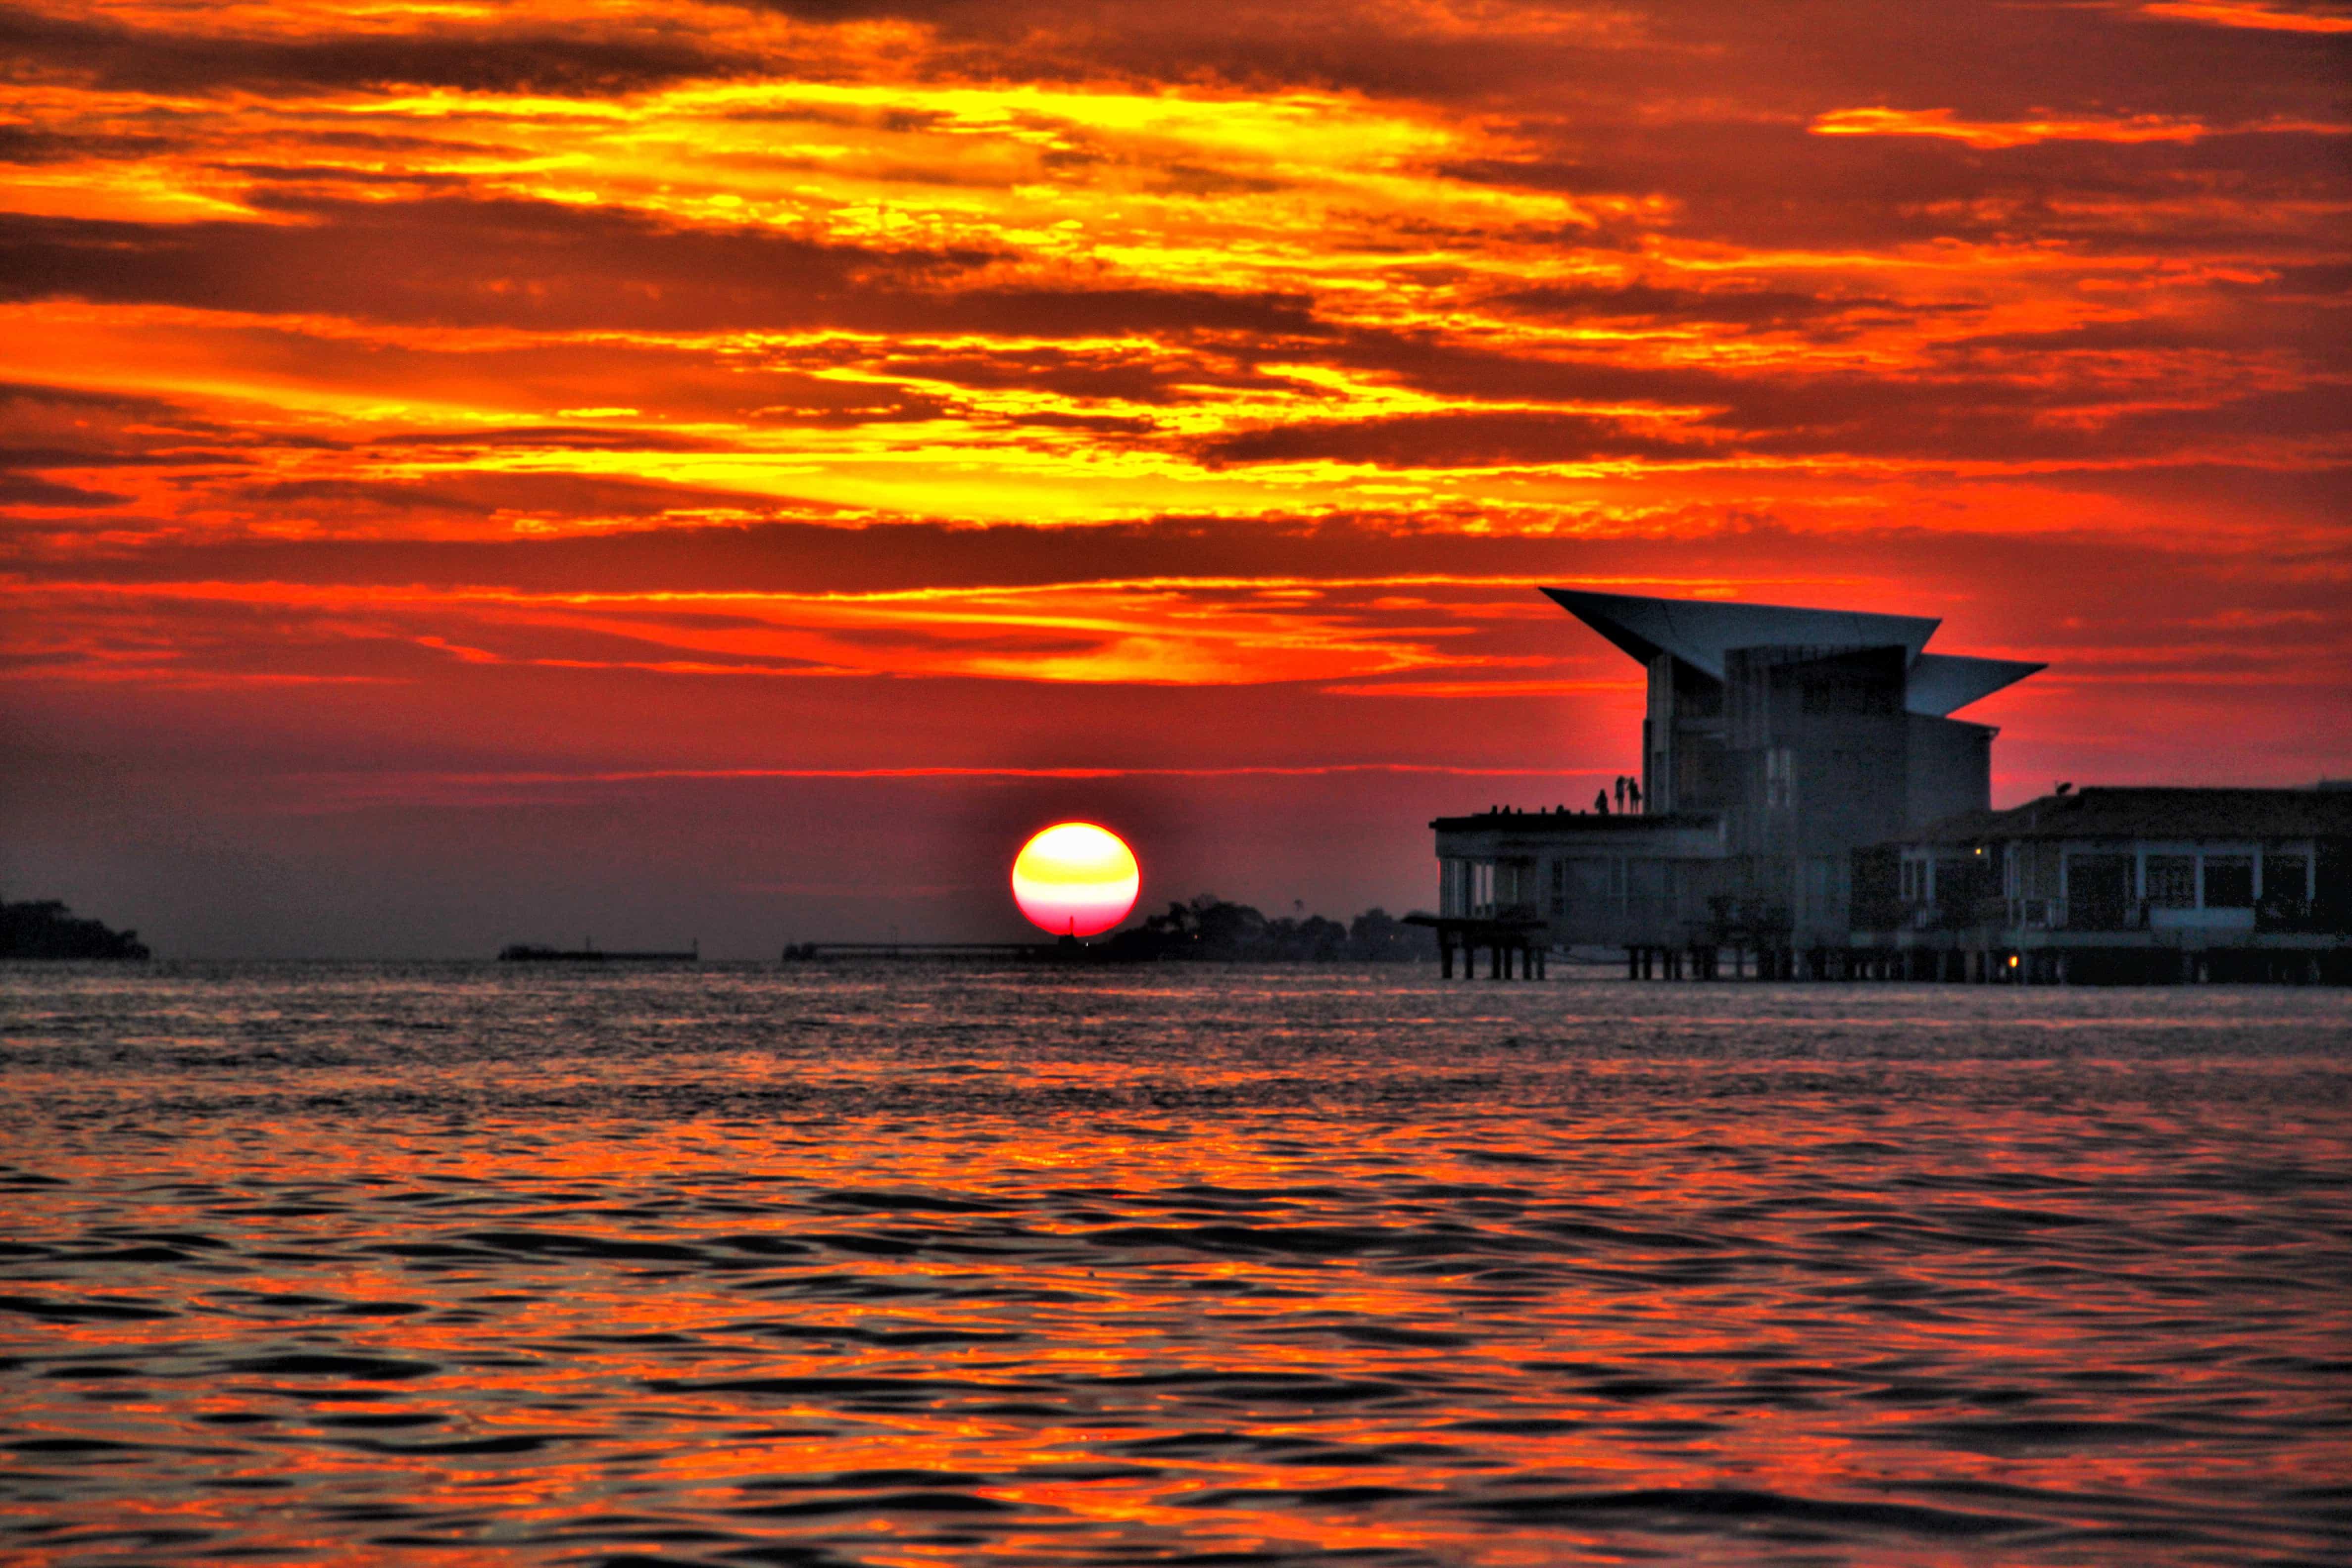 Sunset at Port Dickson